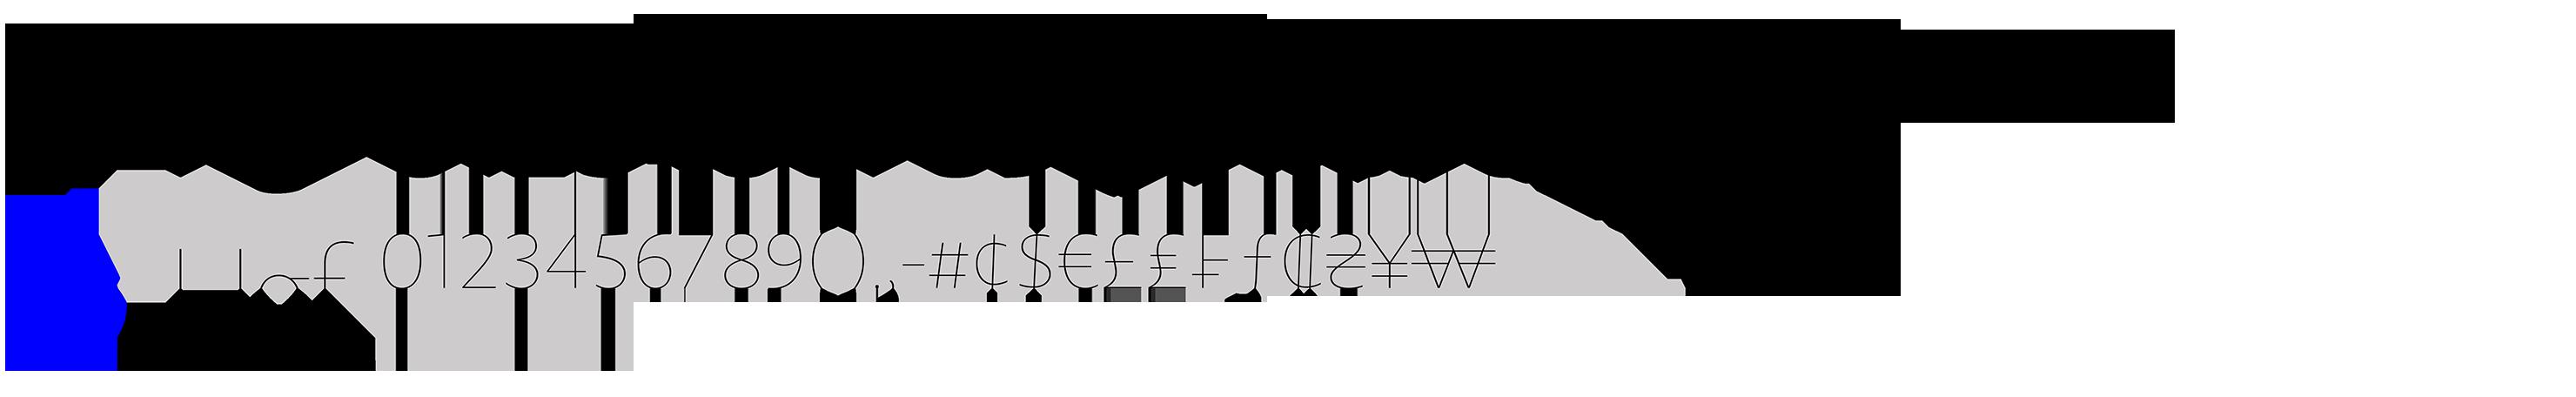 Typeface-Novel-Sans-Hairline-F16-Atlas-Font-Foundry